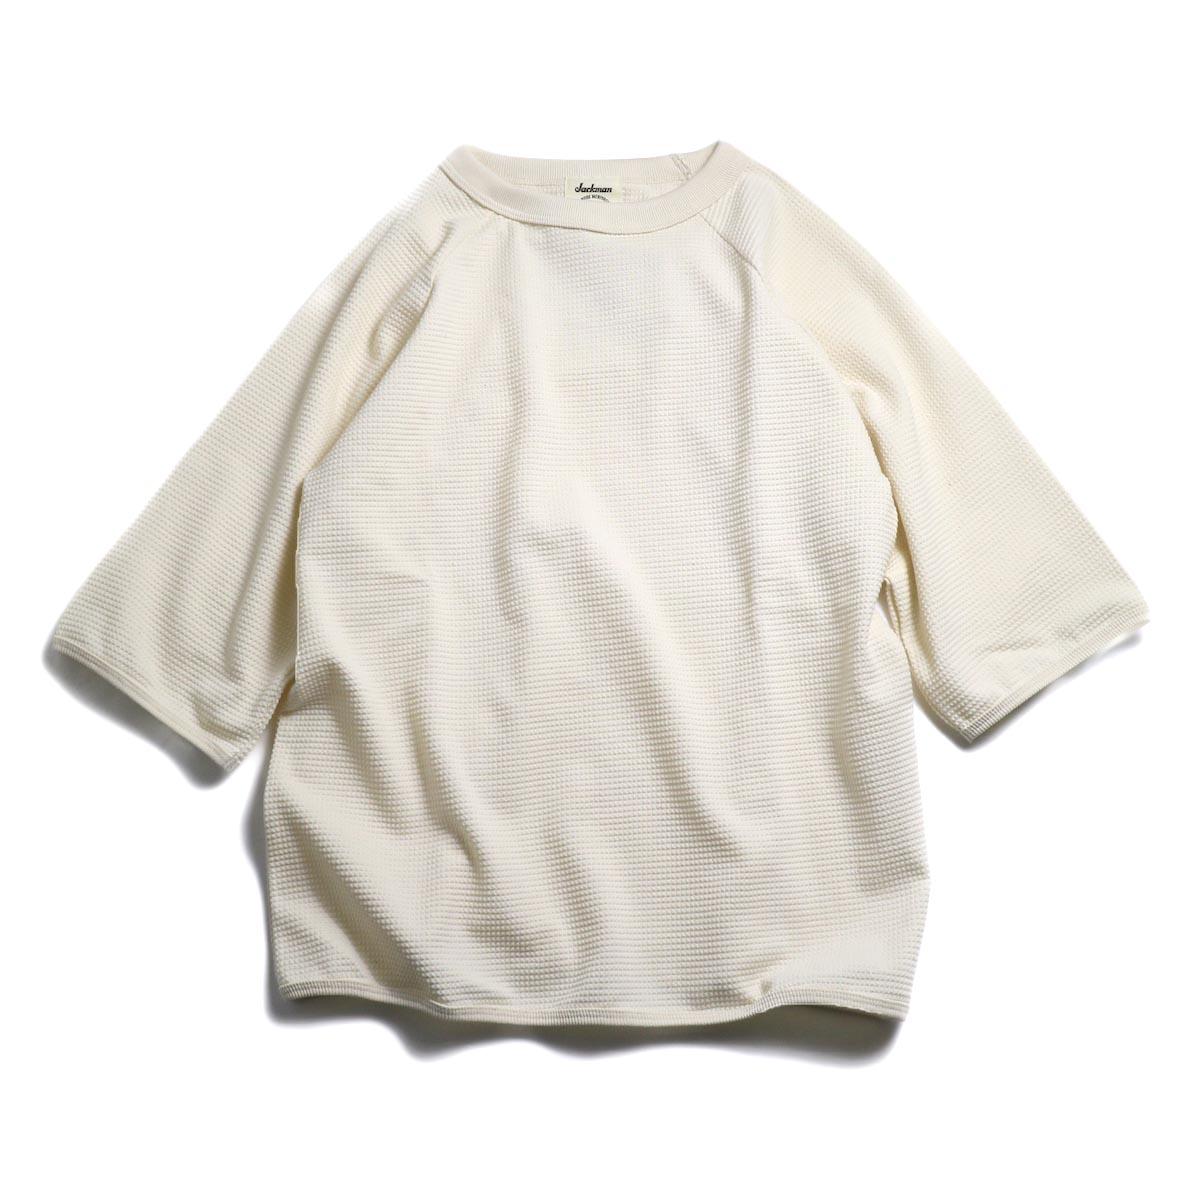 Jackman / 1/2 Sleeved T-Shirt -Ivory